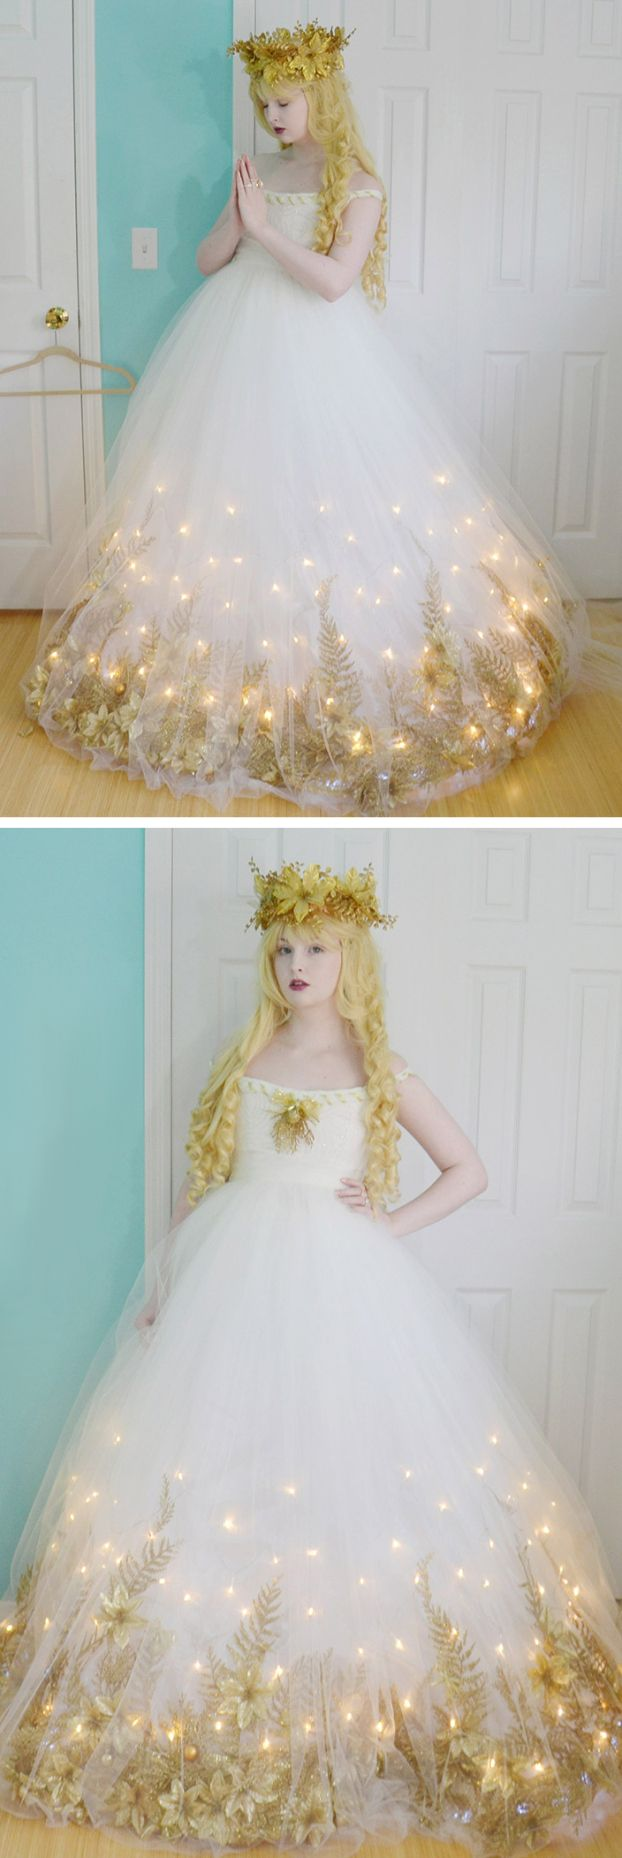 Light up wedding dress  Awesome DIY inspiration A light up fairy garden tulle maxi dress